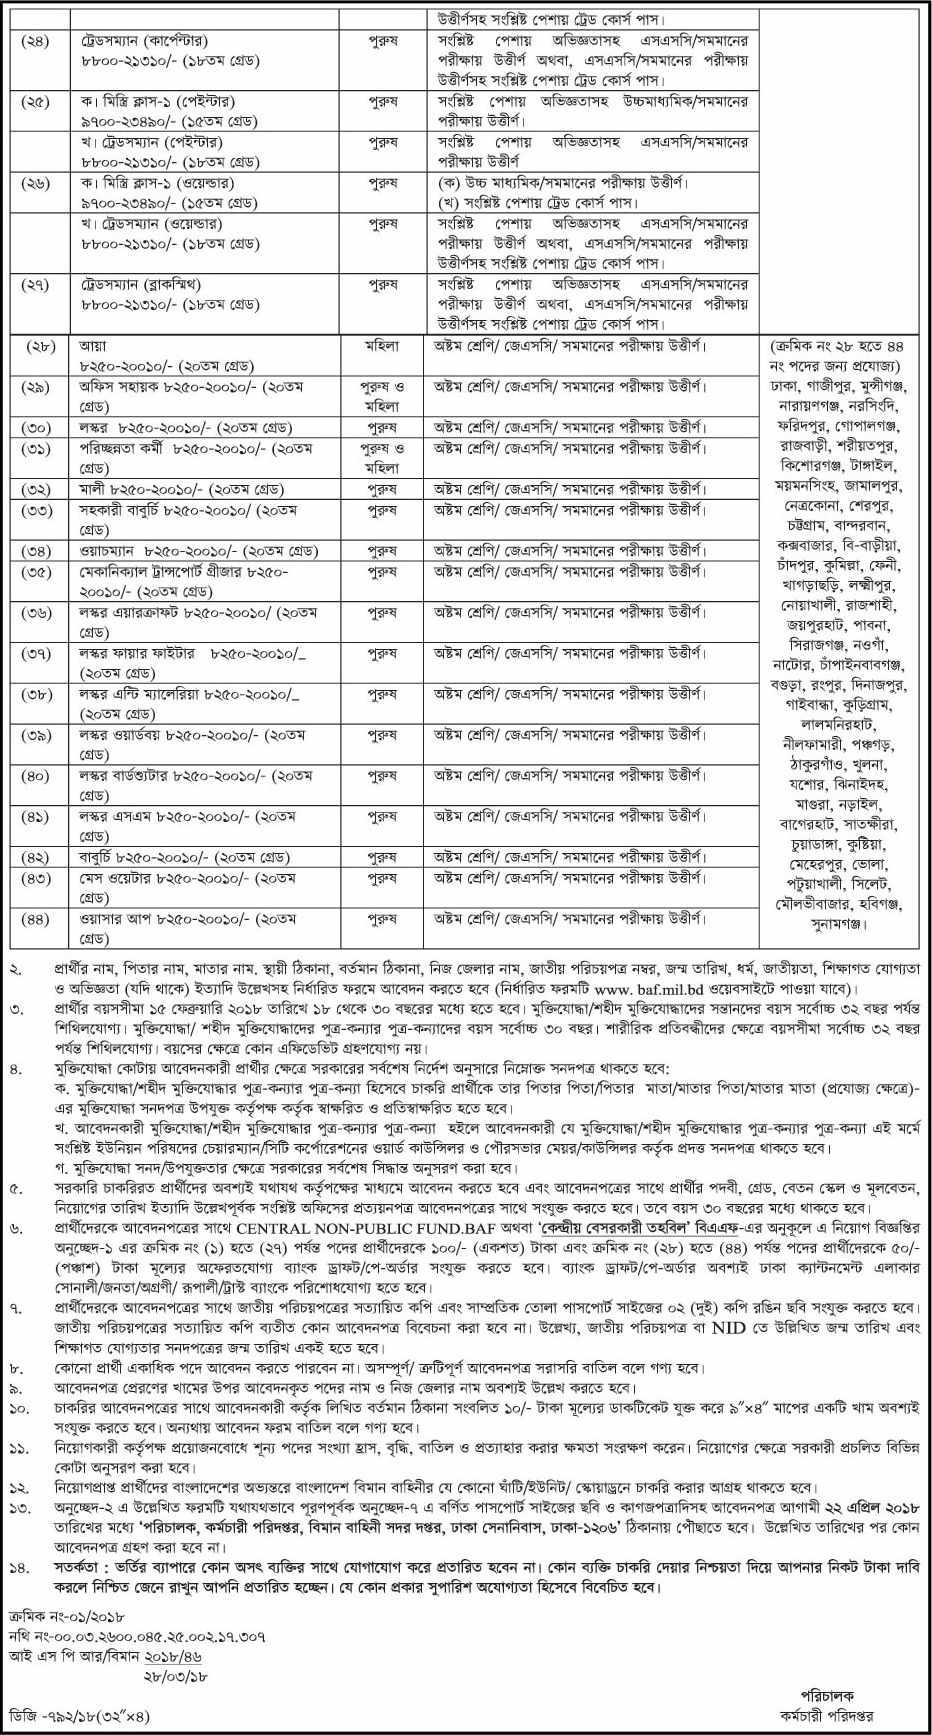 Biman Bangladesh Airlines Ltd job